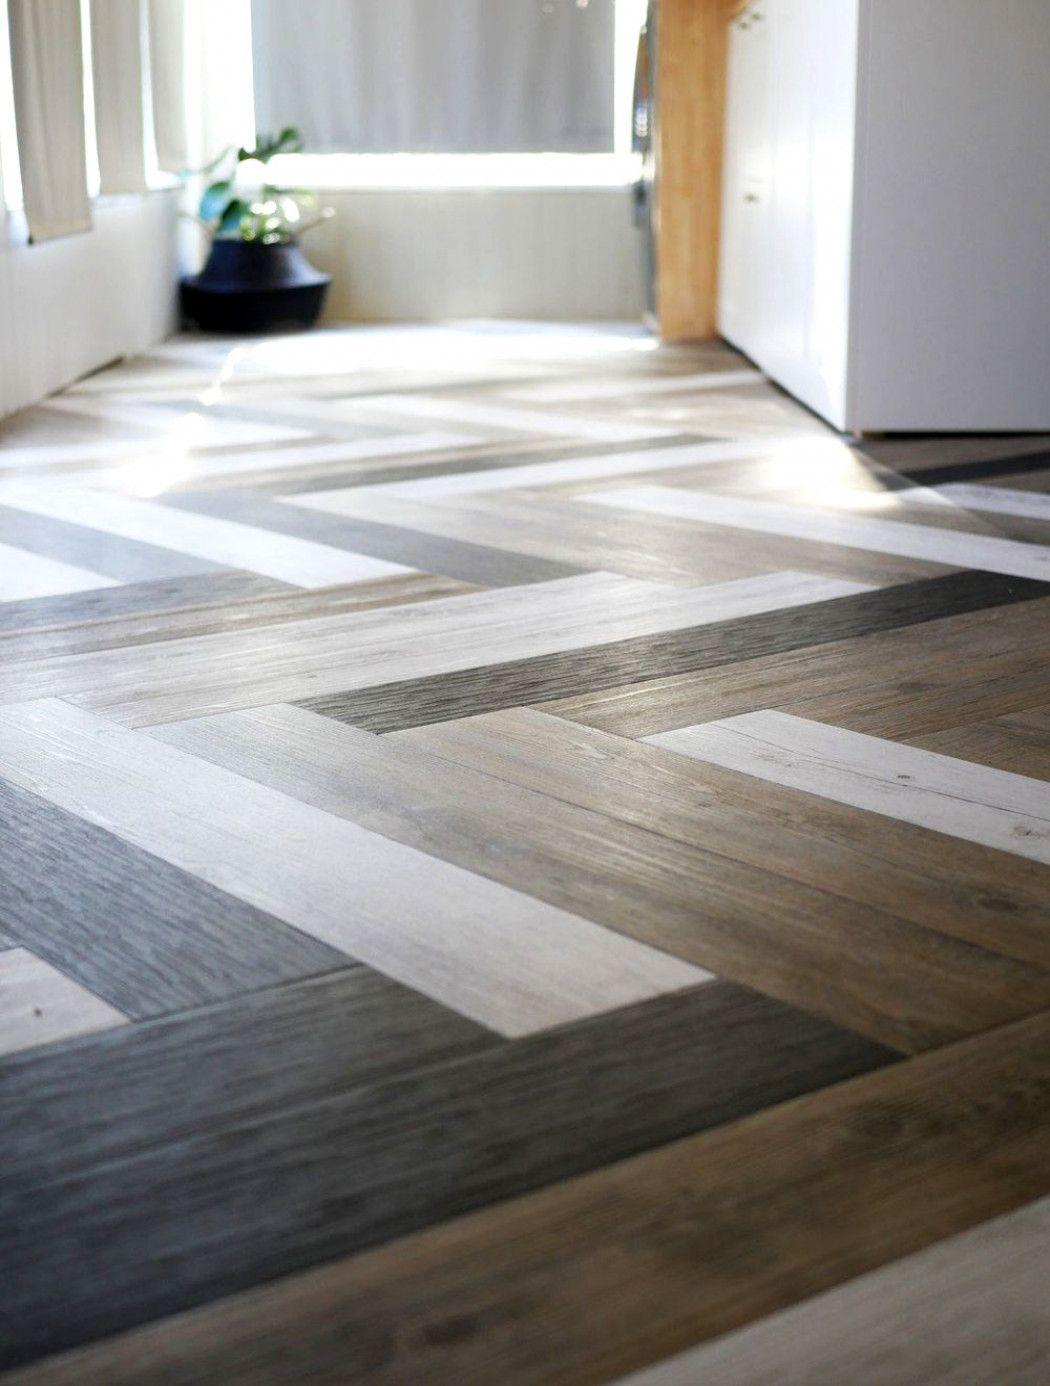 Zig Zag Flooring Ideas Stick Down Herringbone Floor Flooring Homedecor Home Beautifulfloor Basementbar Herringbone Floor Diy Flooring Flooring